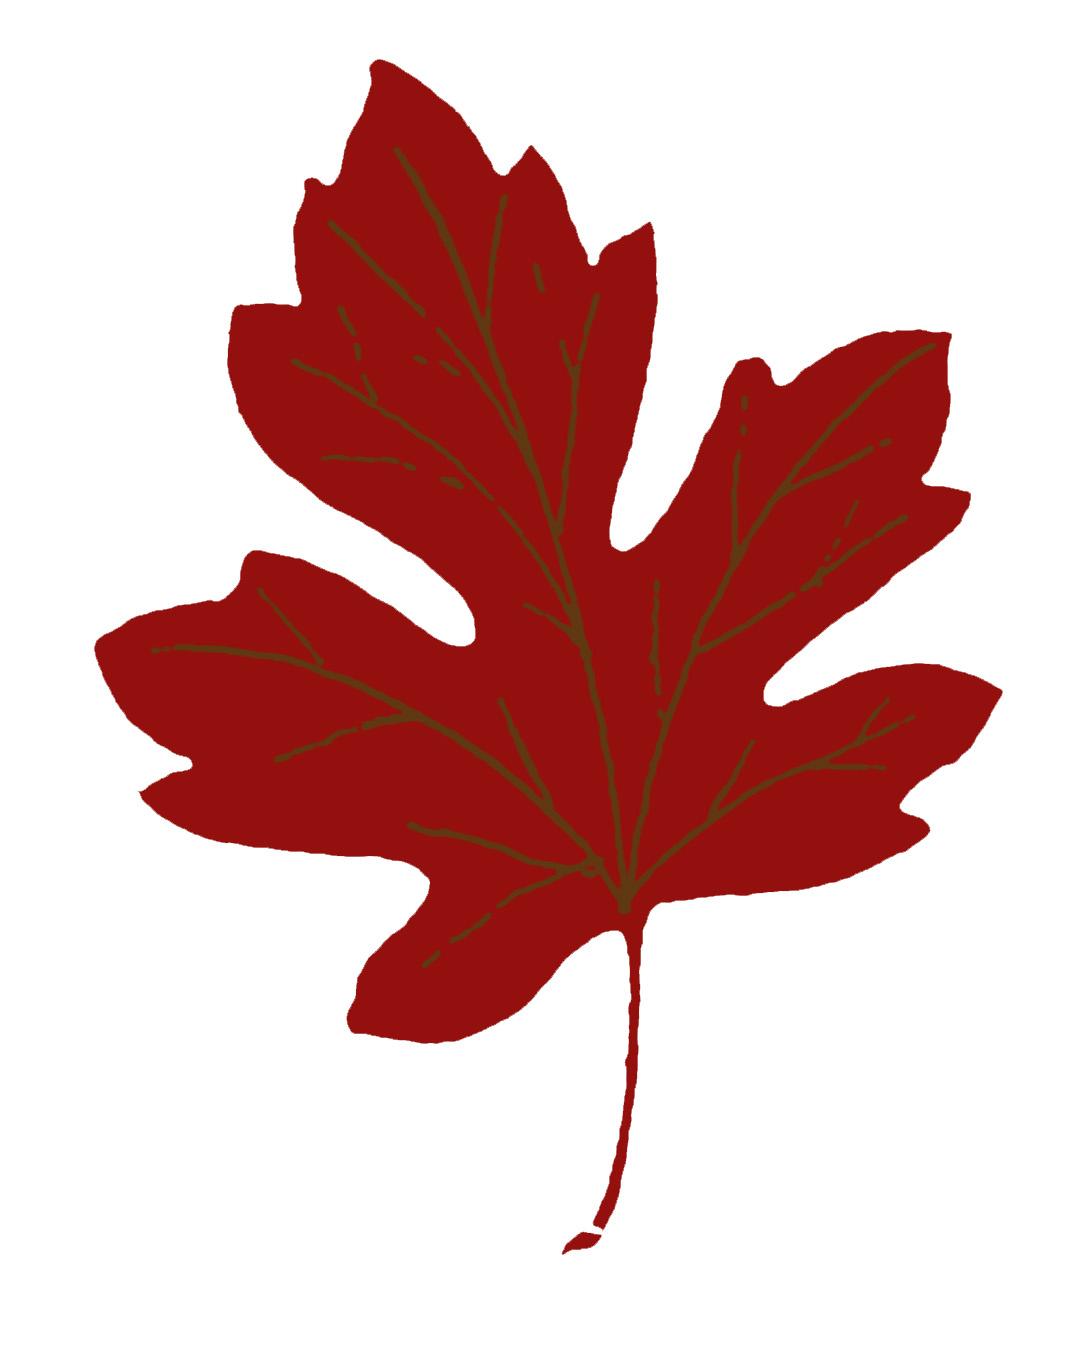 Leaf Images Clip Art : images, Maple, Images!, Graphics, Fairy